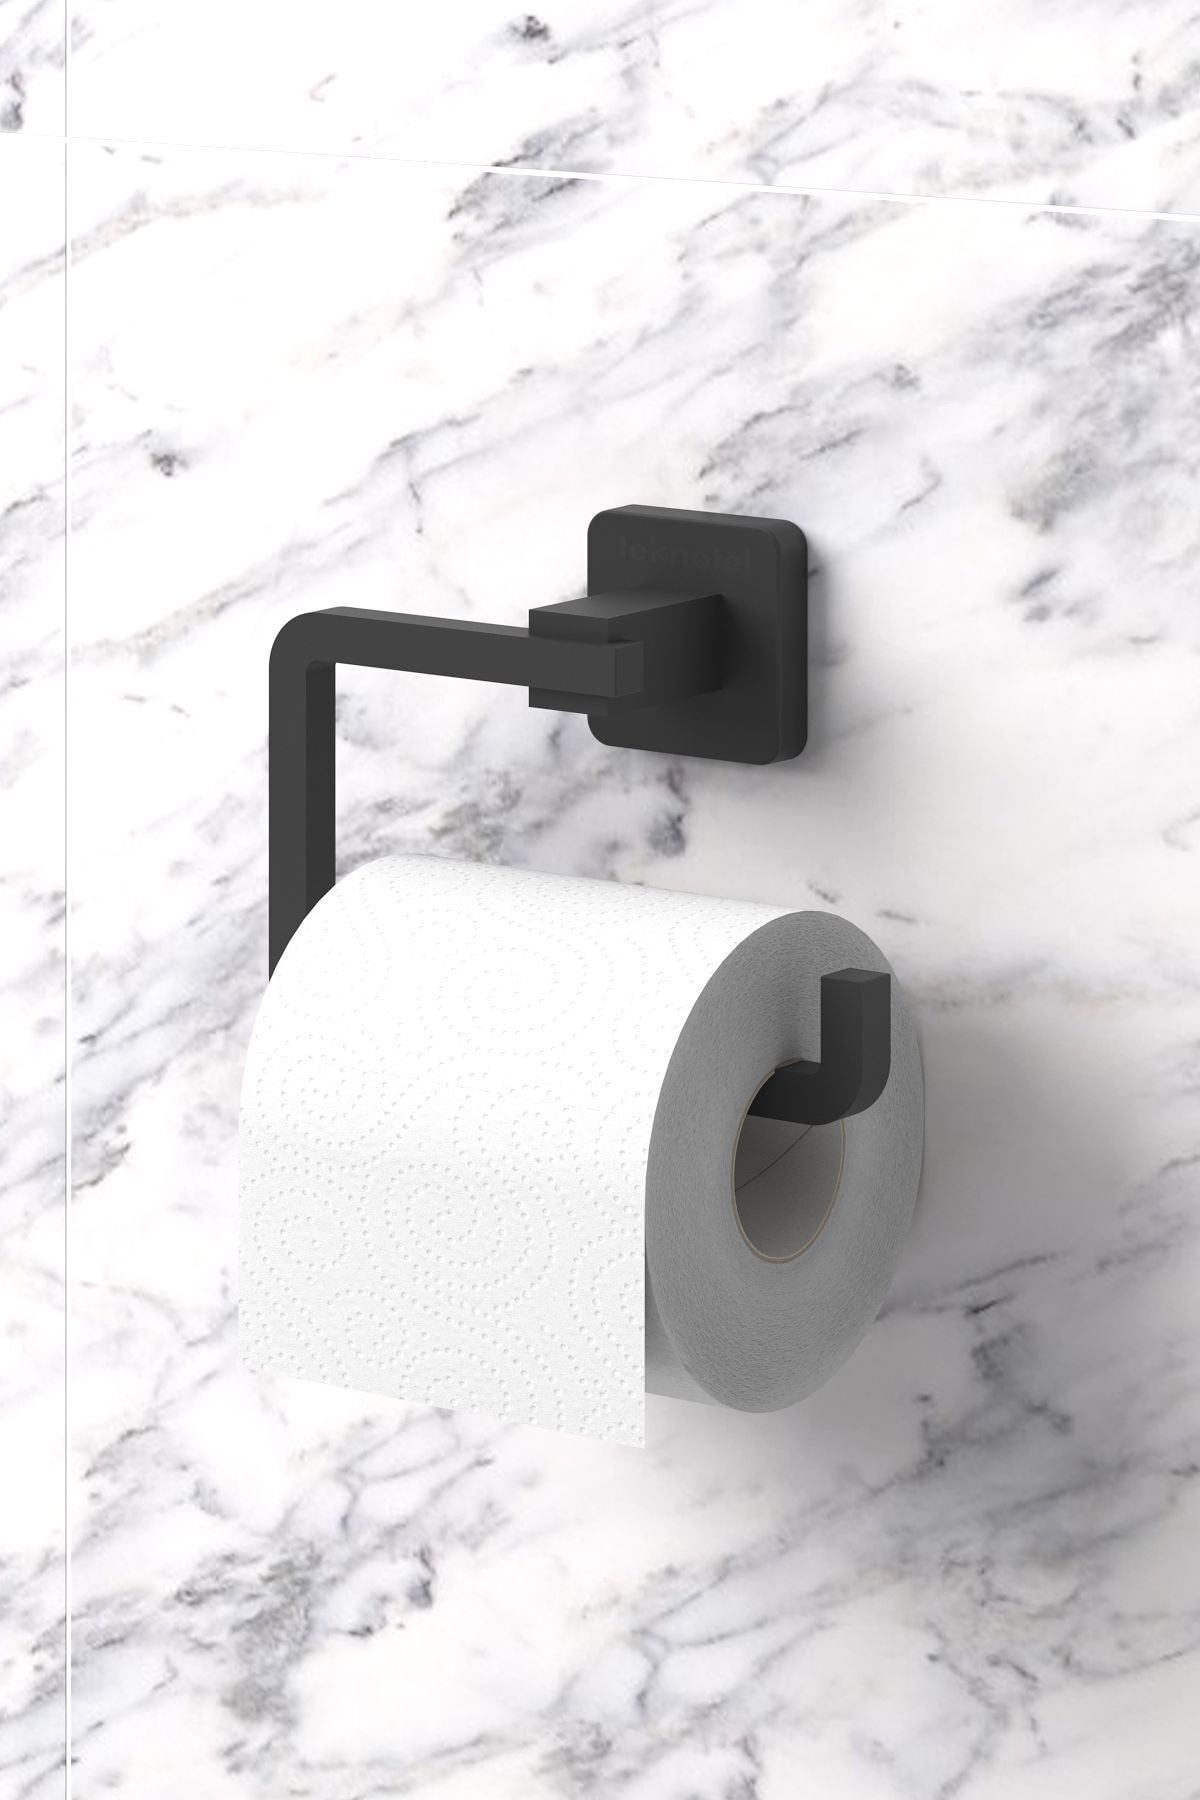 Teknotel Ömür Boyu Paslanmaz Tuvalet Kağıtlık Mat Siyah Mg394 1